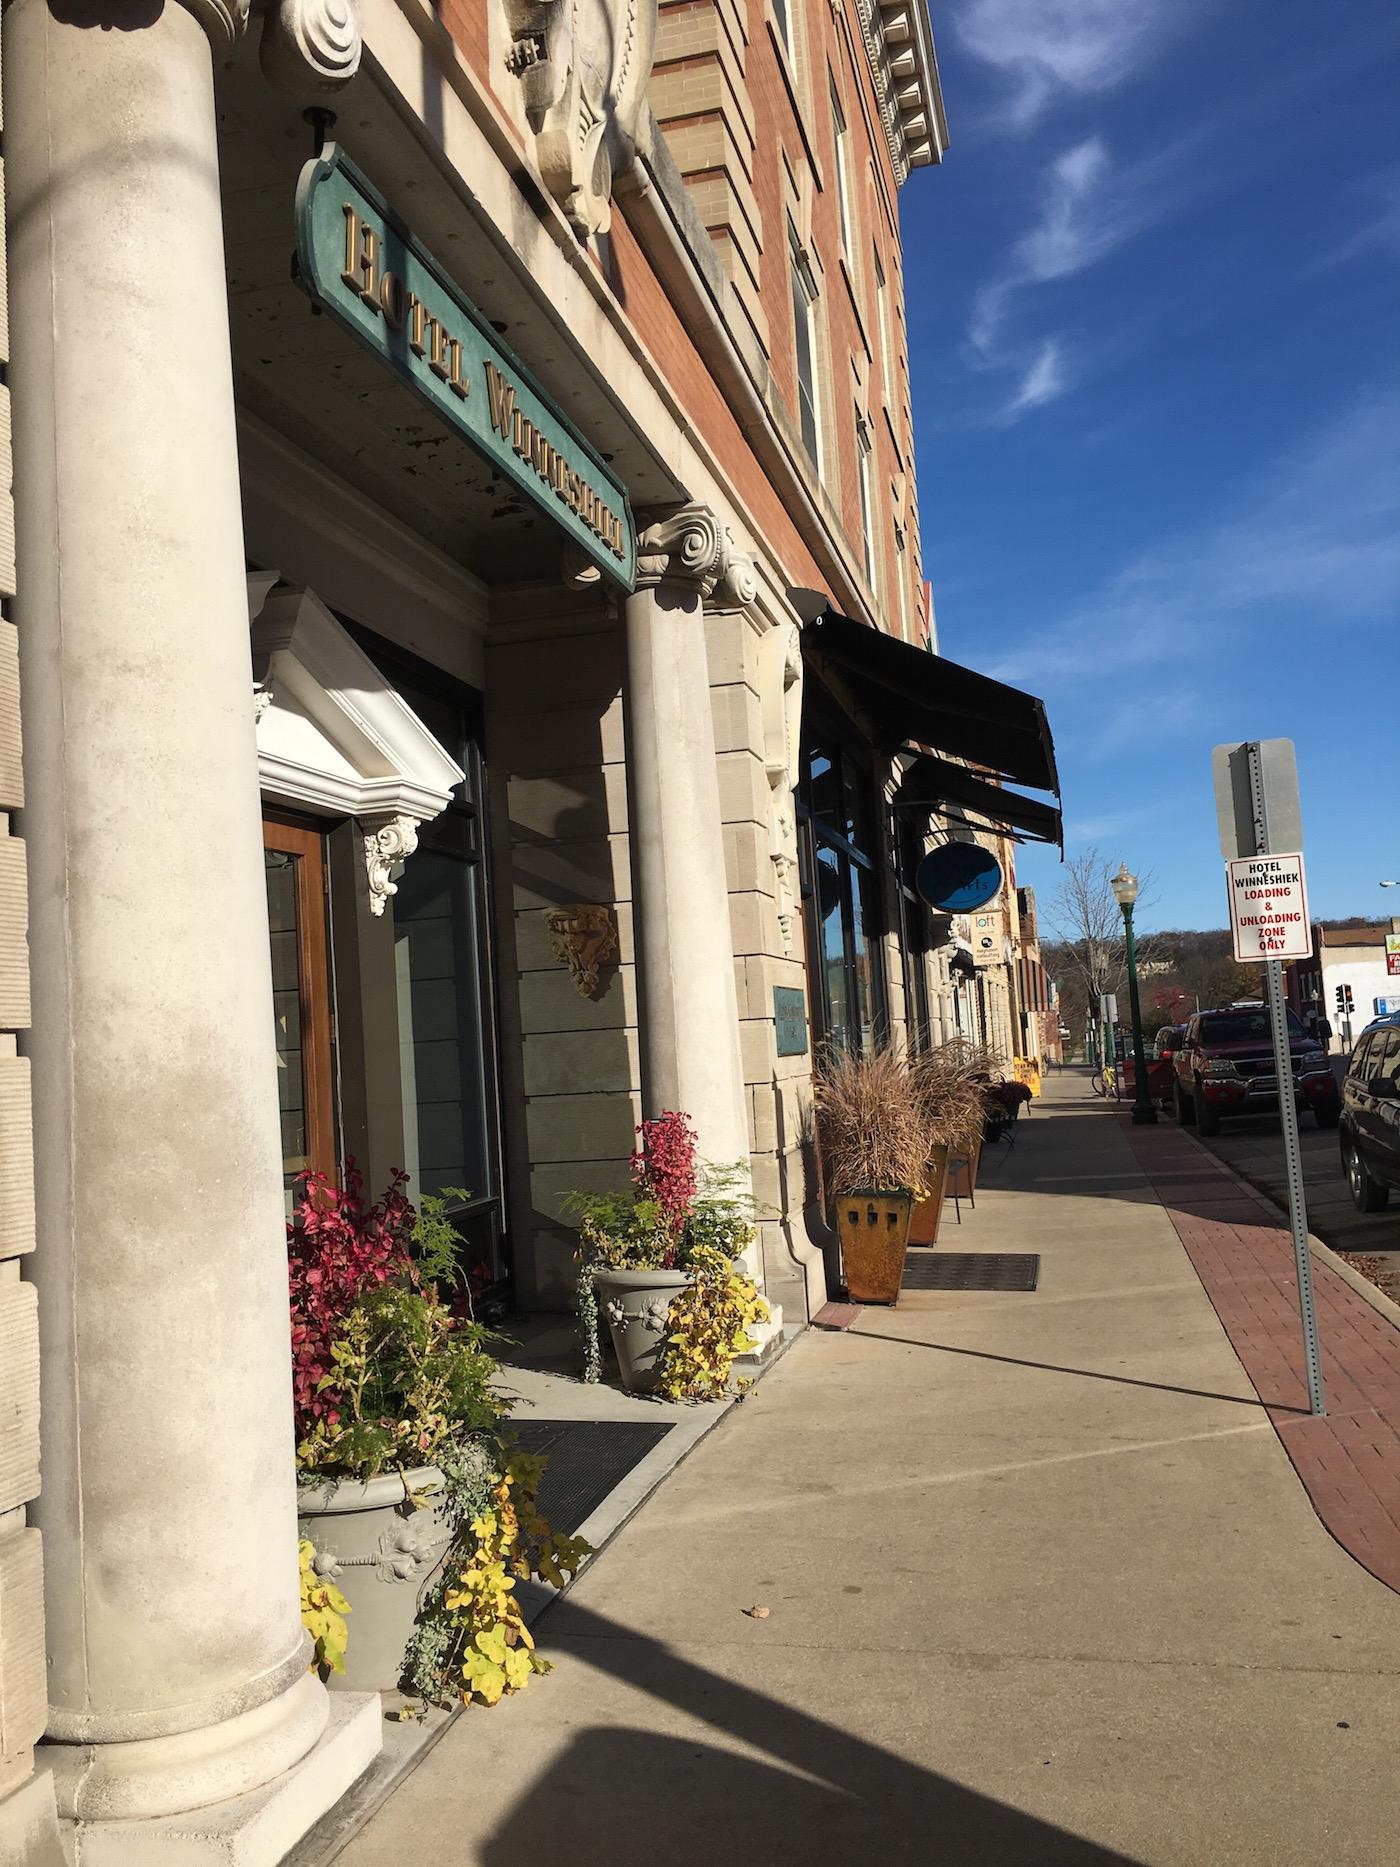 Decorah, Iowa: The Cutest Town You've Never Heard Of